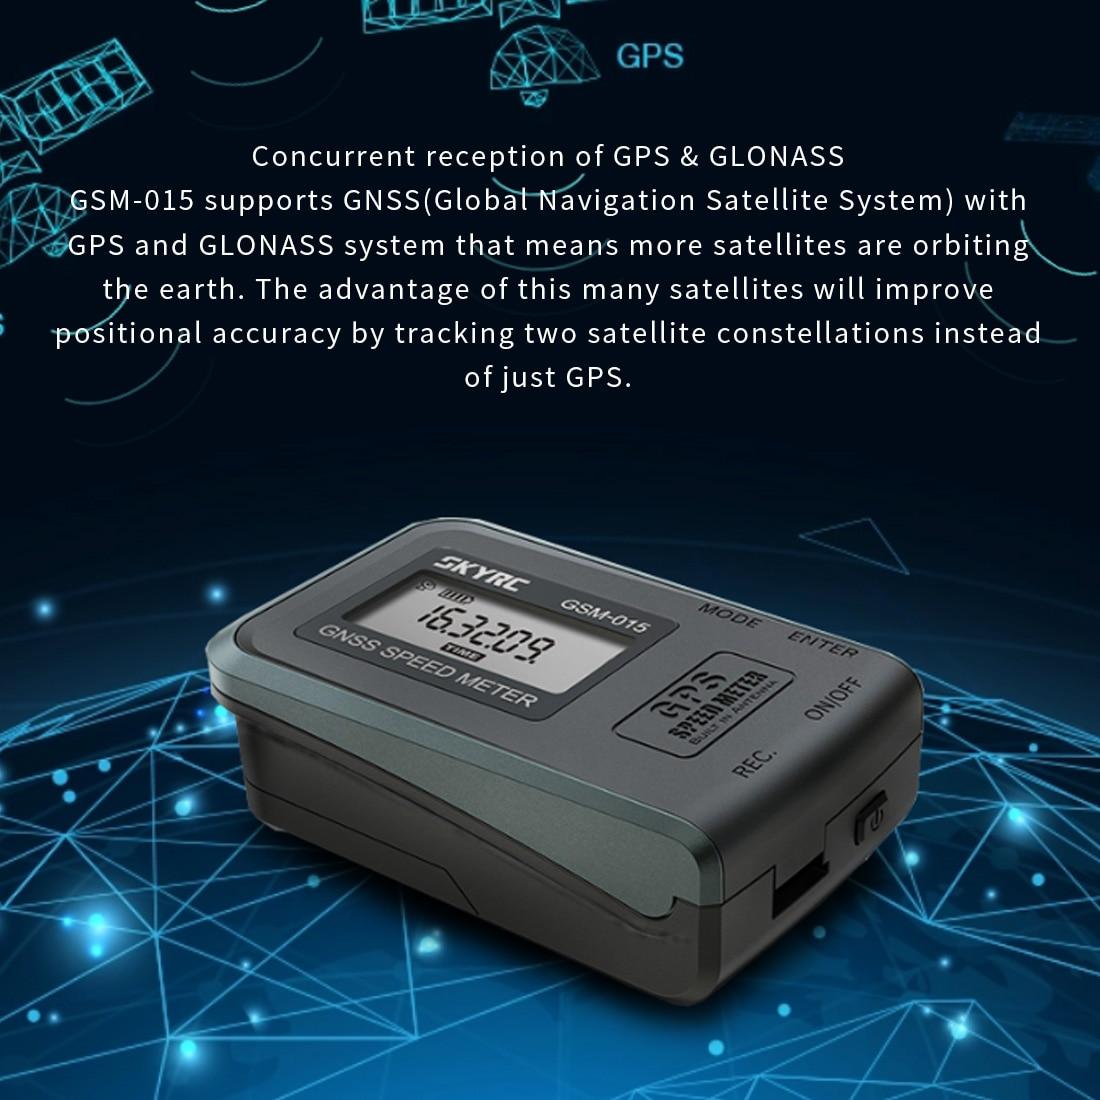 Nieuwe SKYRC GNSS GPS Speed Meter GSM 015 Hoge Precisie GPS Snelheidsmeter voor RC Drone FPV Multirotor Quadcopter Helicopter-in Onderdelen & accessoires van Speelgoed & Hobbies op  Groep 3